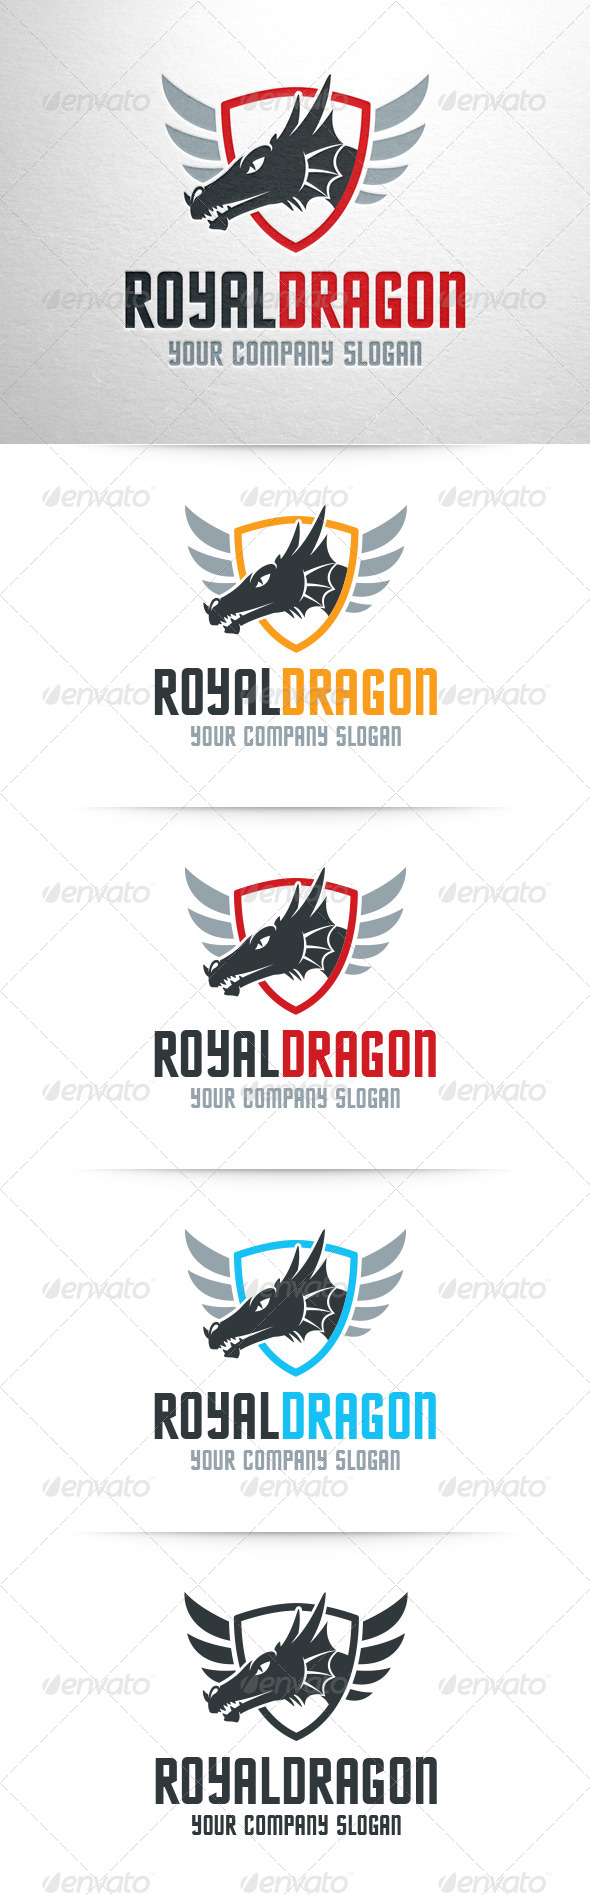 GraphicRiver Royal Dragon Logo Template 6904177